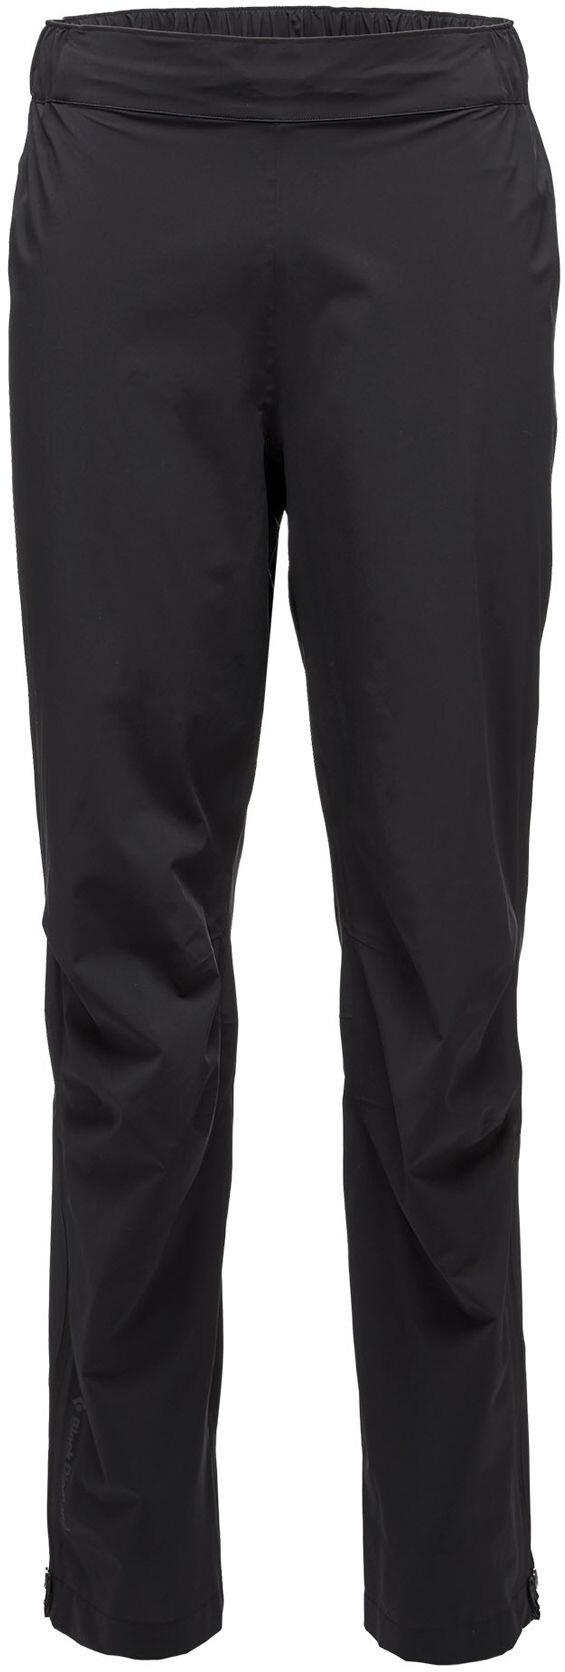 Vaude Grody Pants IV niños lluvia pantalones negro